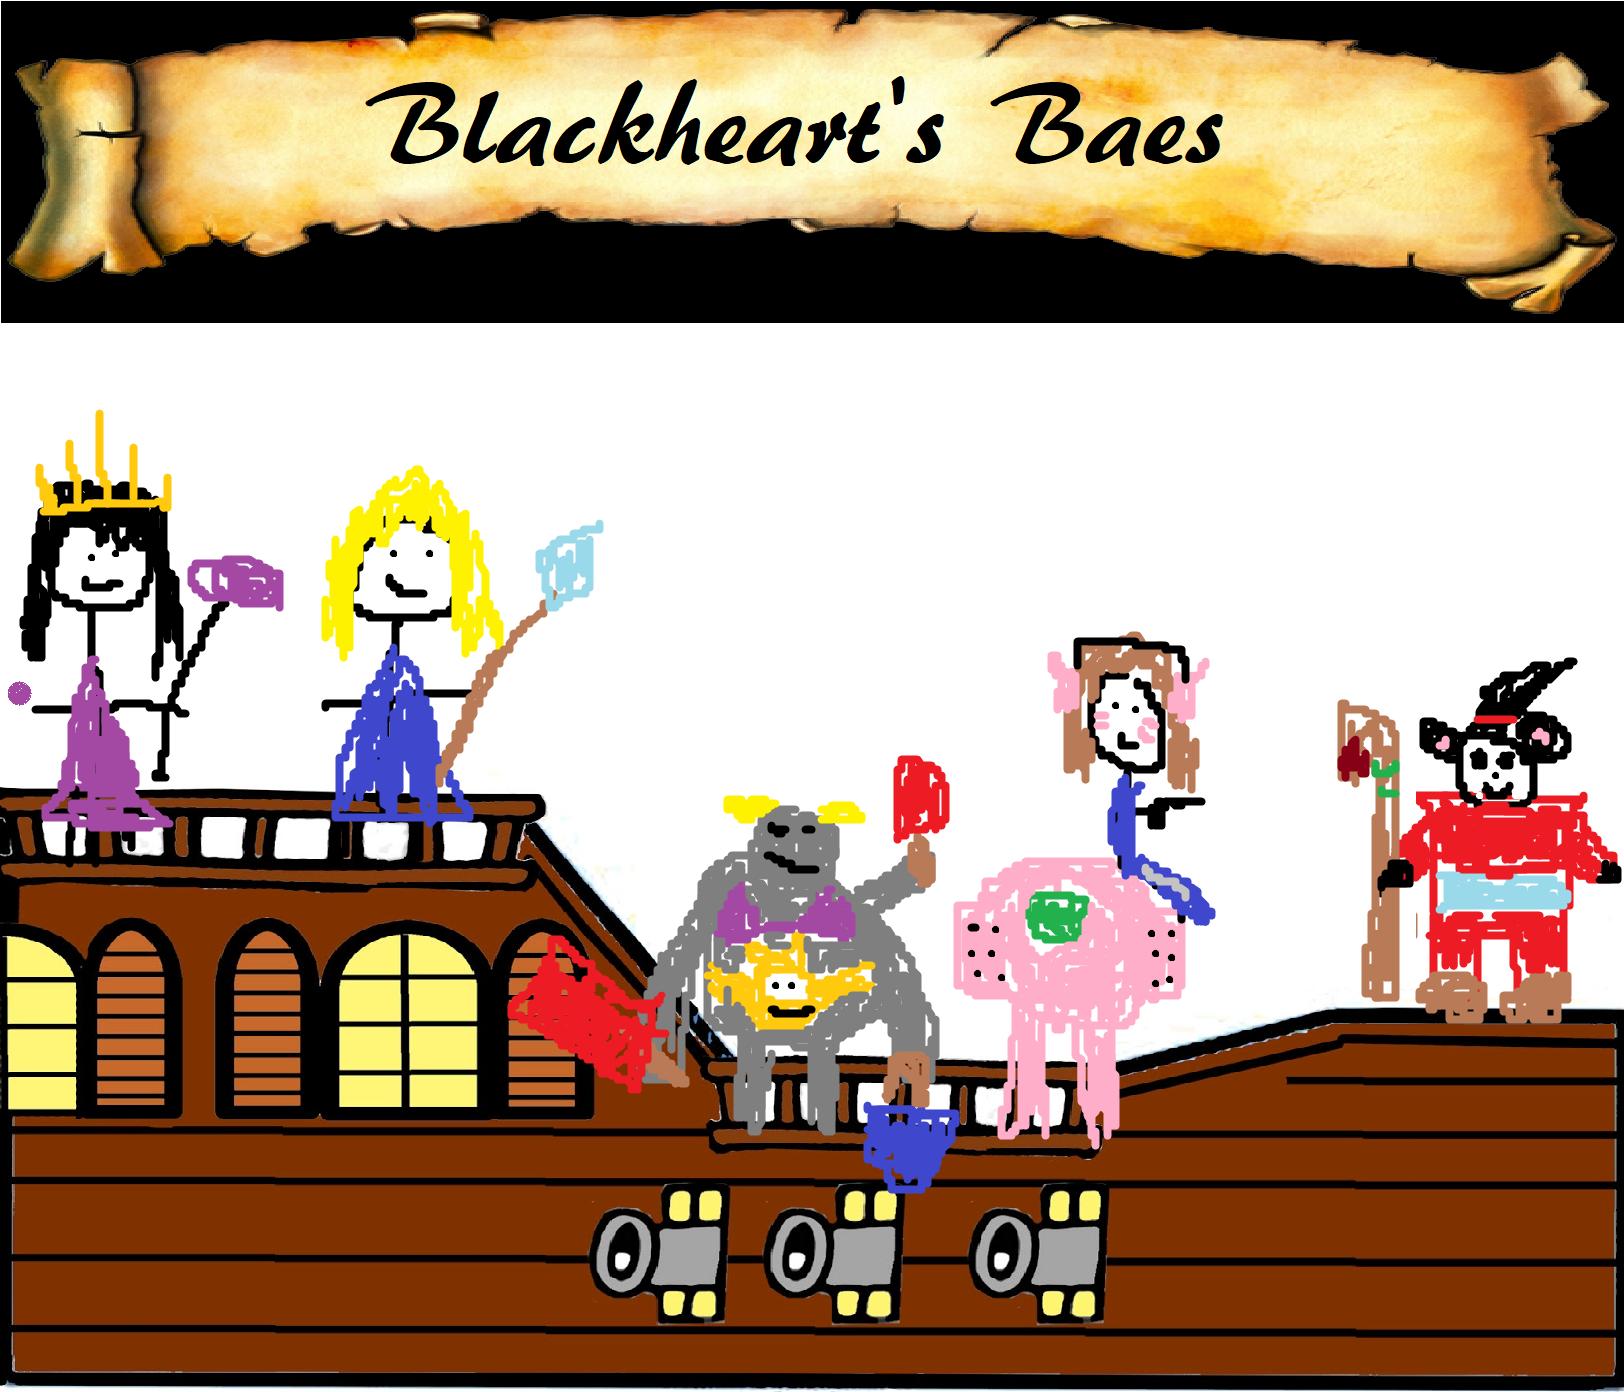 Blackheart's Baes